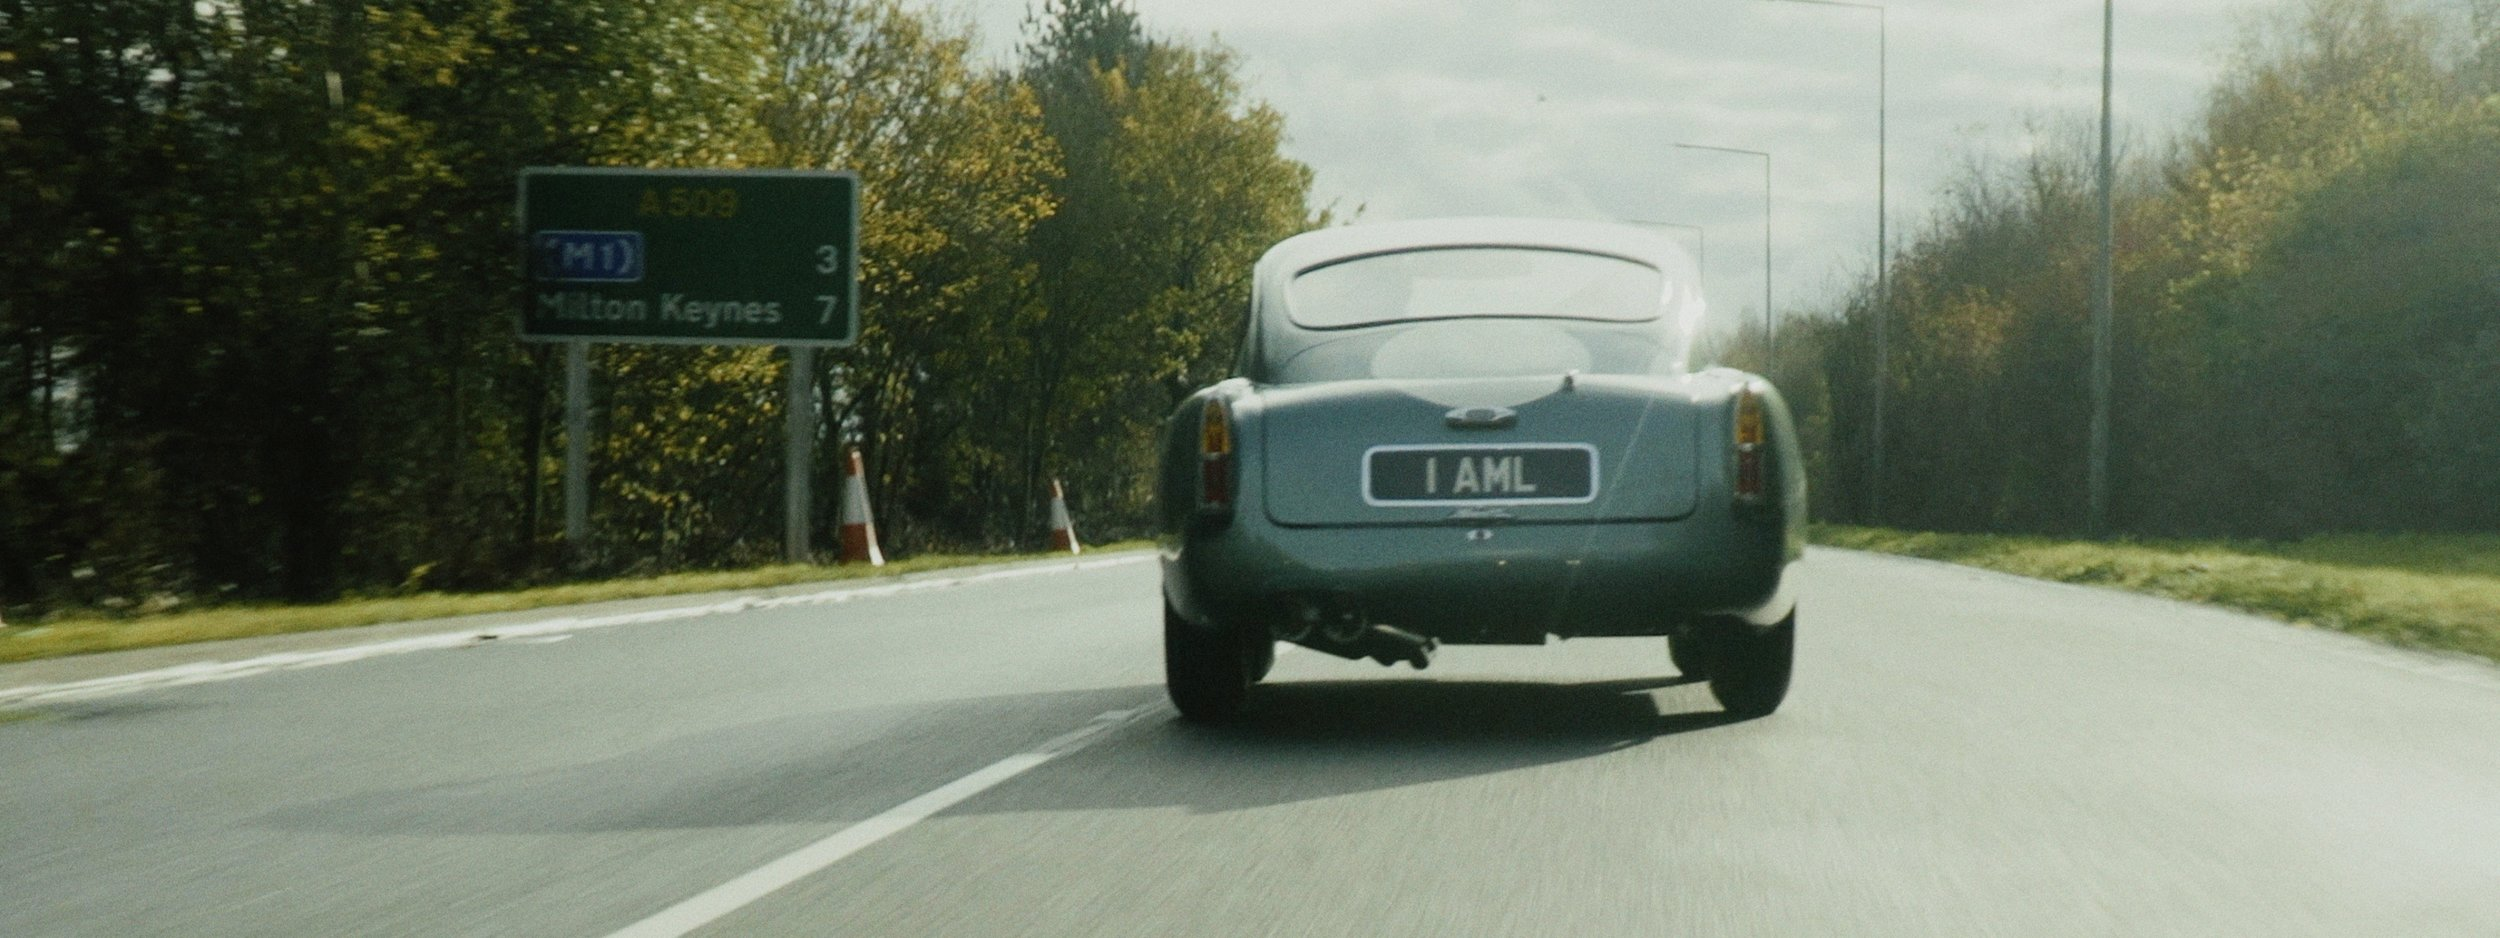 Aston DB4 frame 14.jpg